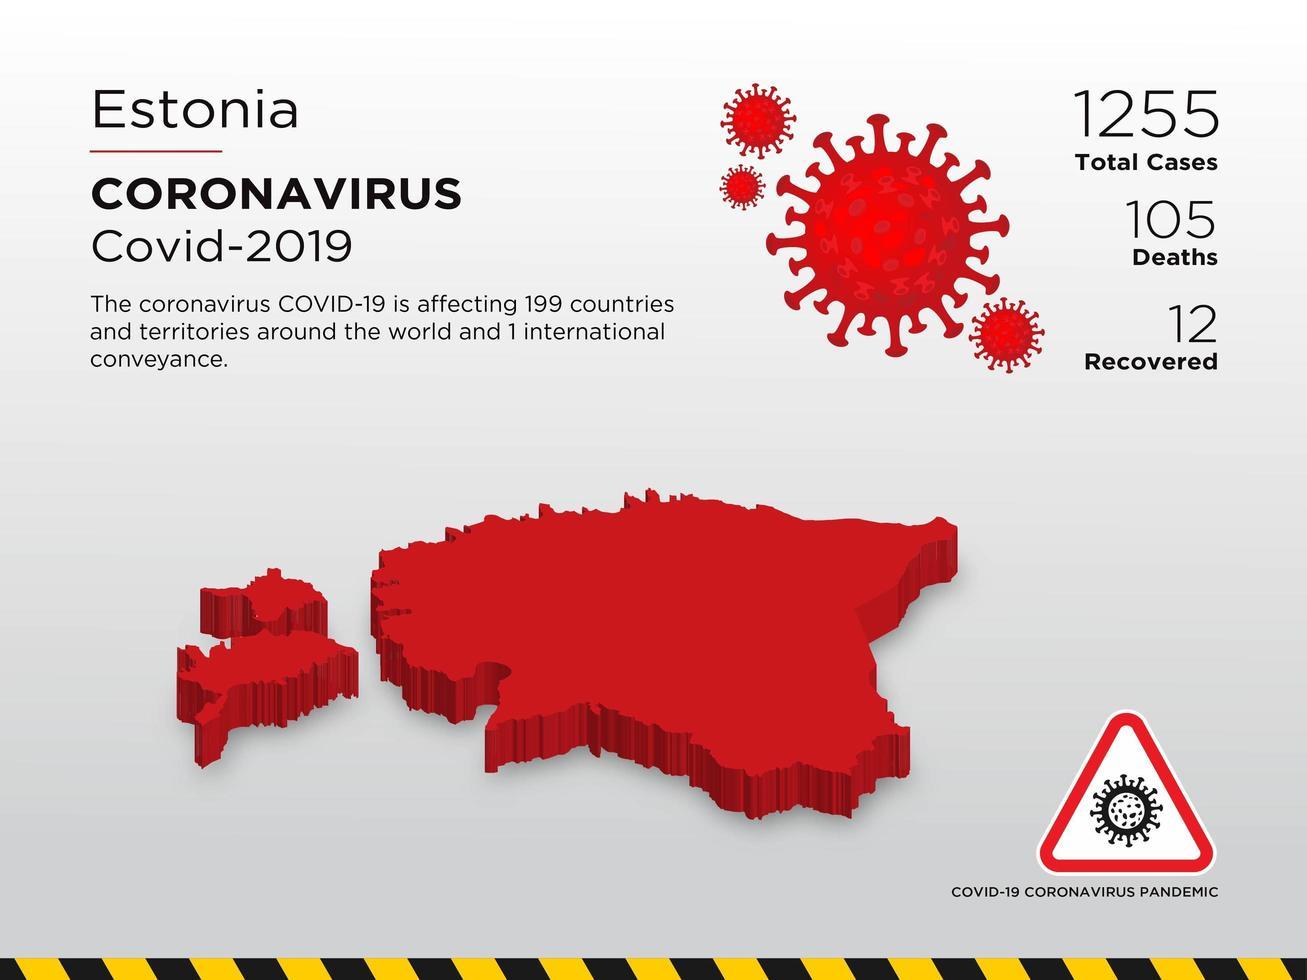 Estonia Affected Country Map of Coronavirus Spread  vector